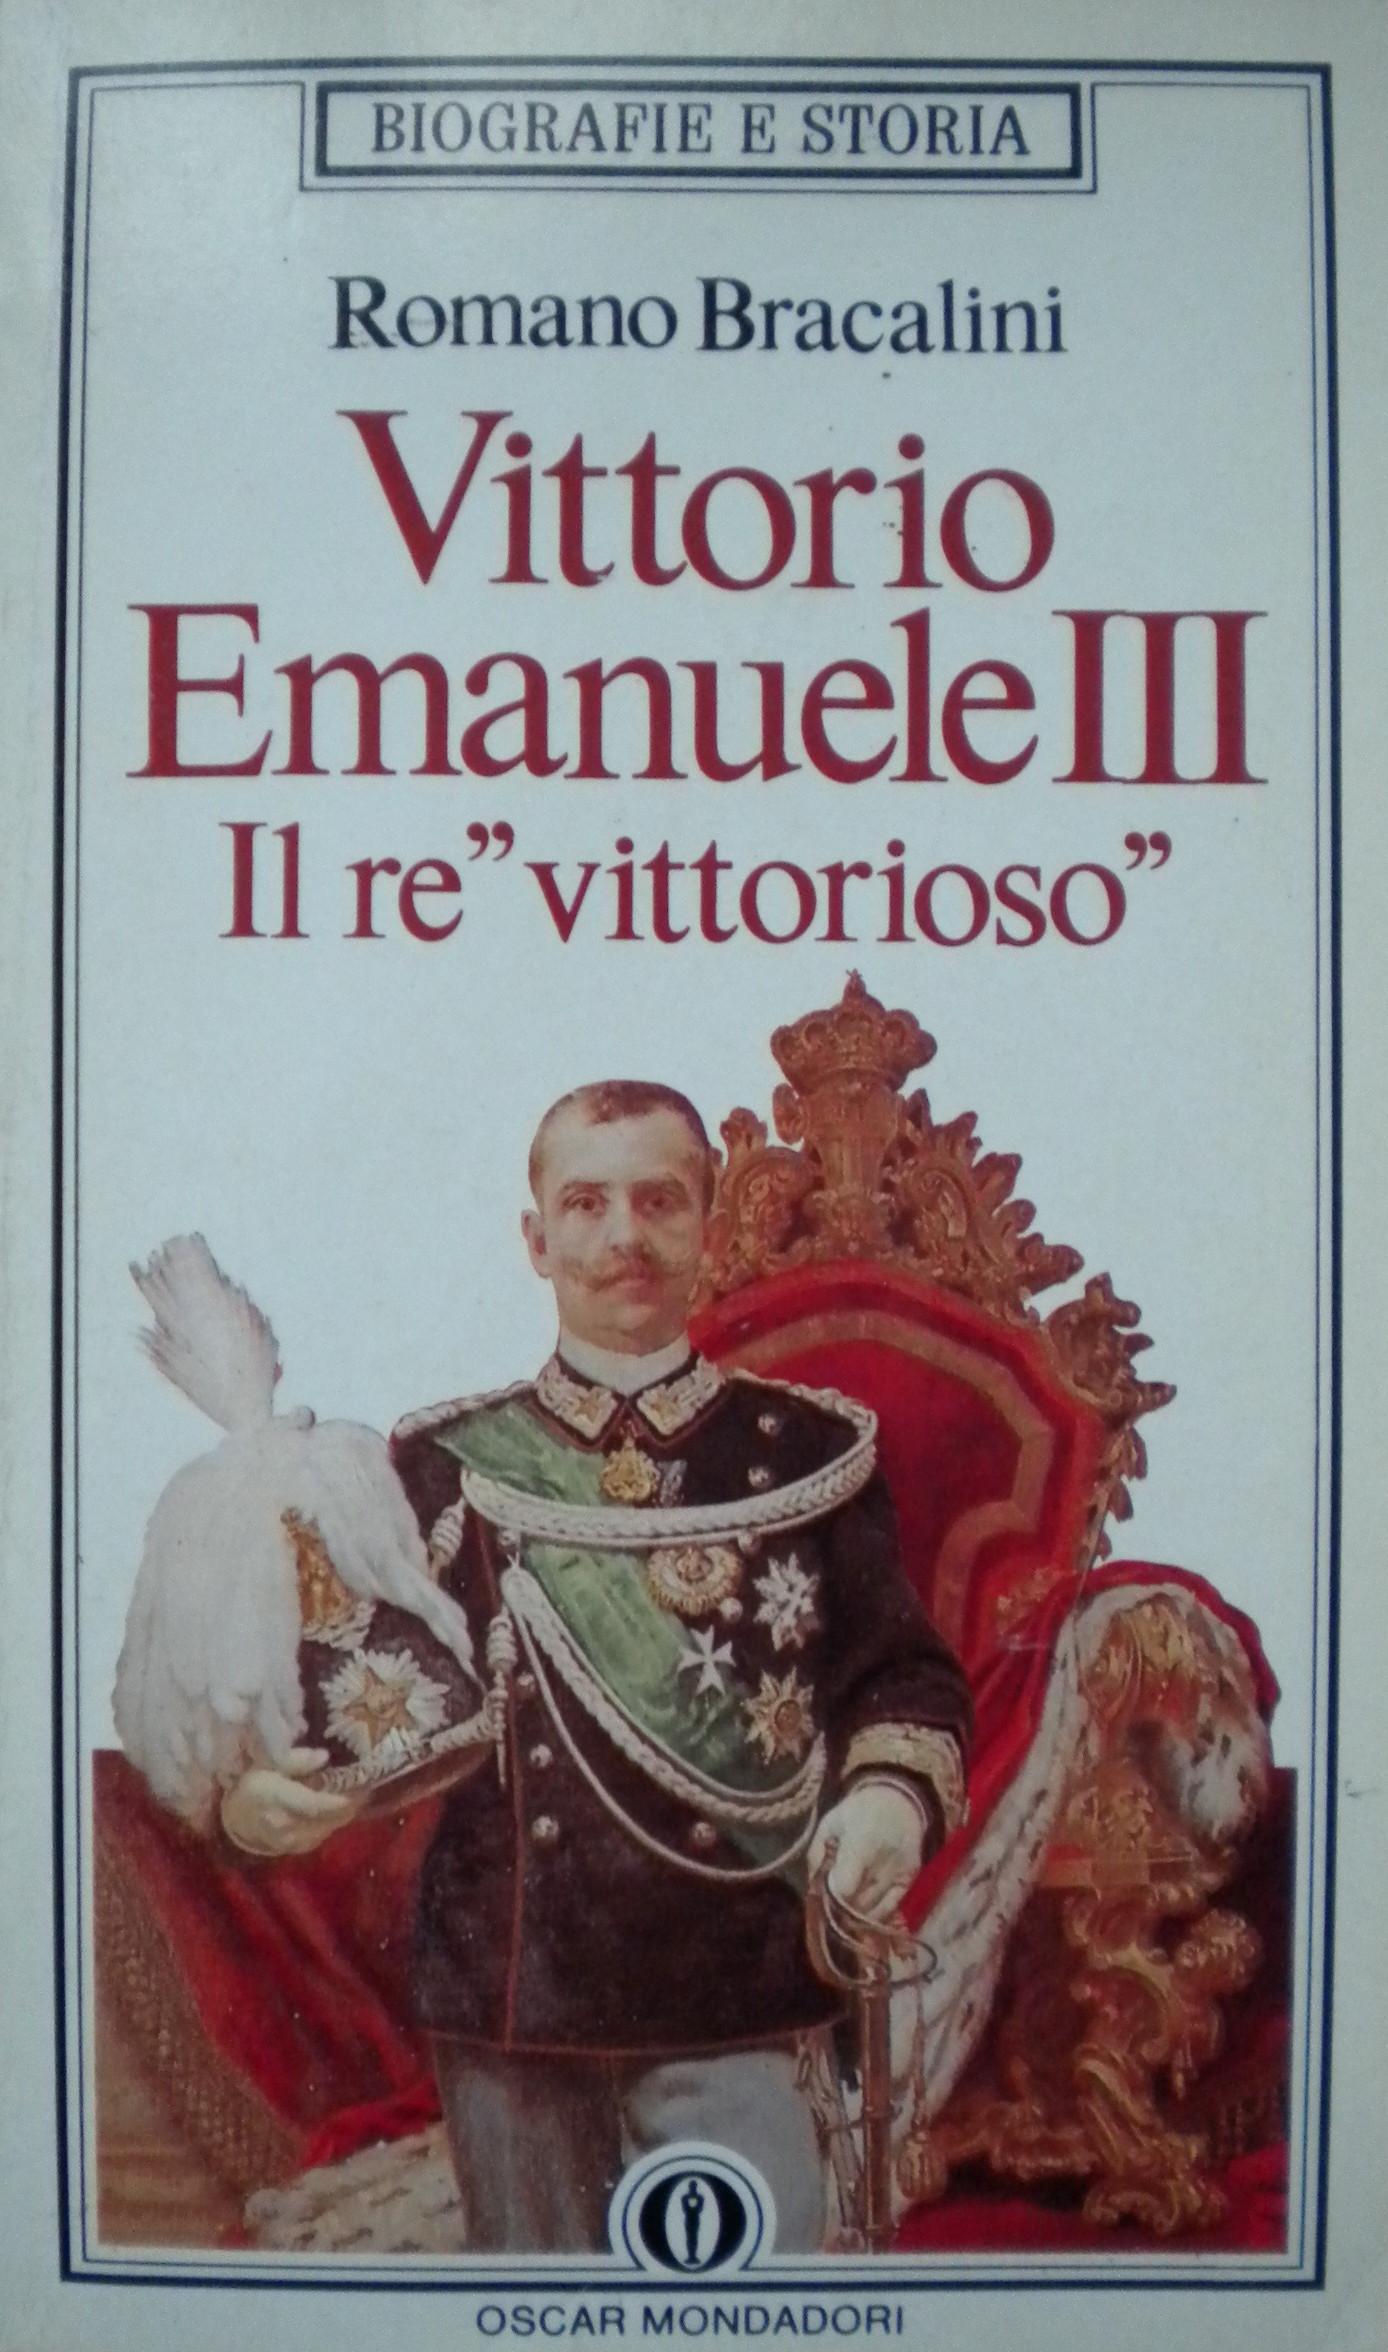 Vittorio Emanuele III